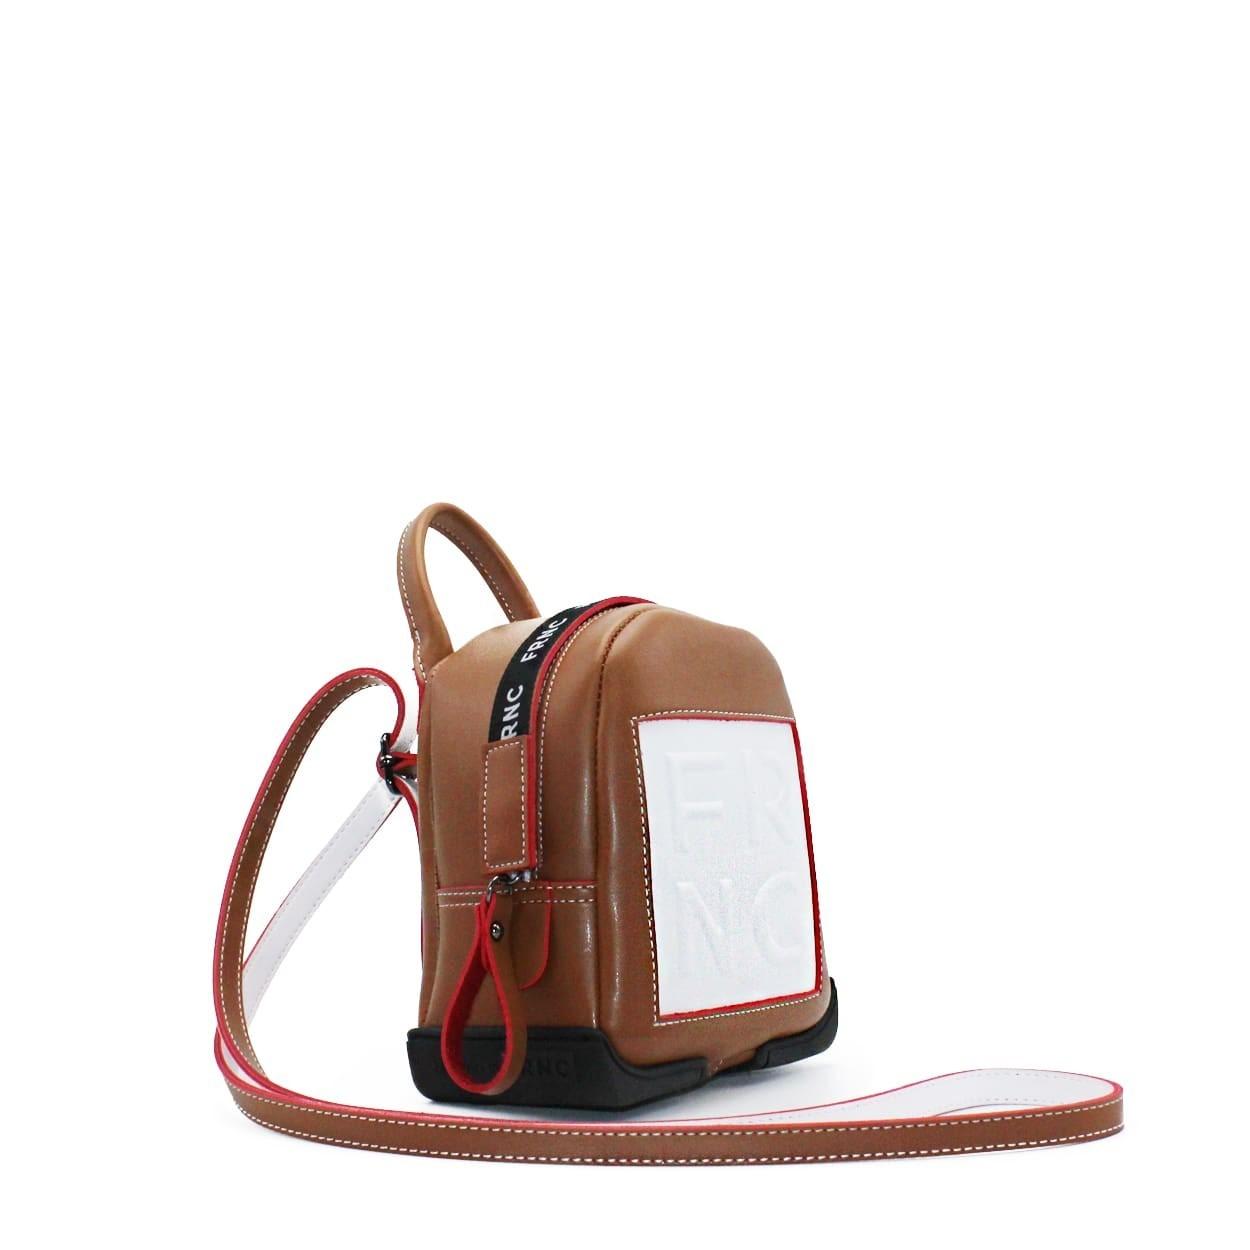 8dbcf72e87 FRNC FRANCESCO Τσάντα Γυναικεία Πλάτης-Backpack 2024 Ταμπά Δέρμα ...